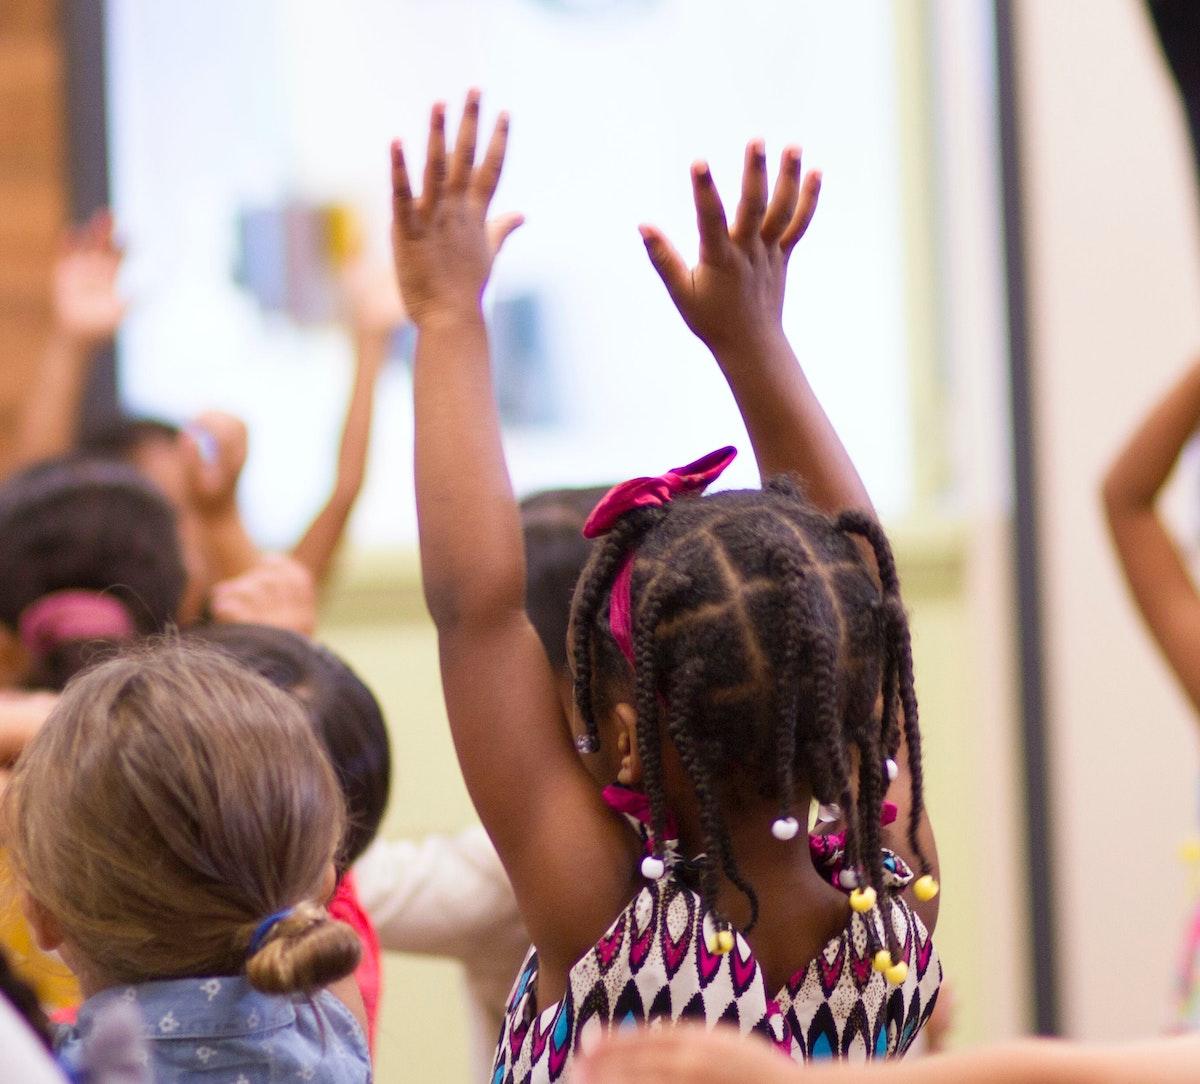 Do My Kids Belong in Big Church Yet?